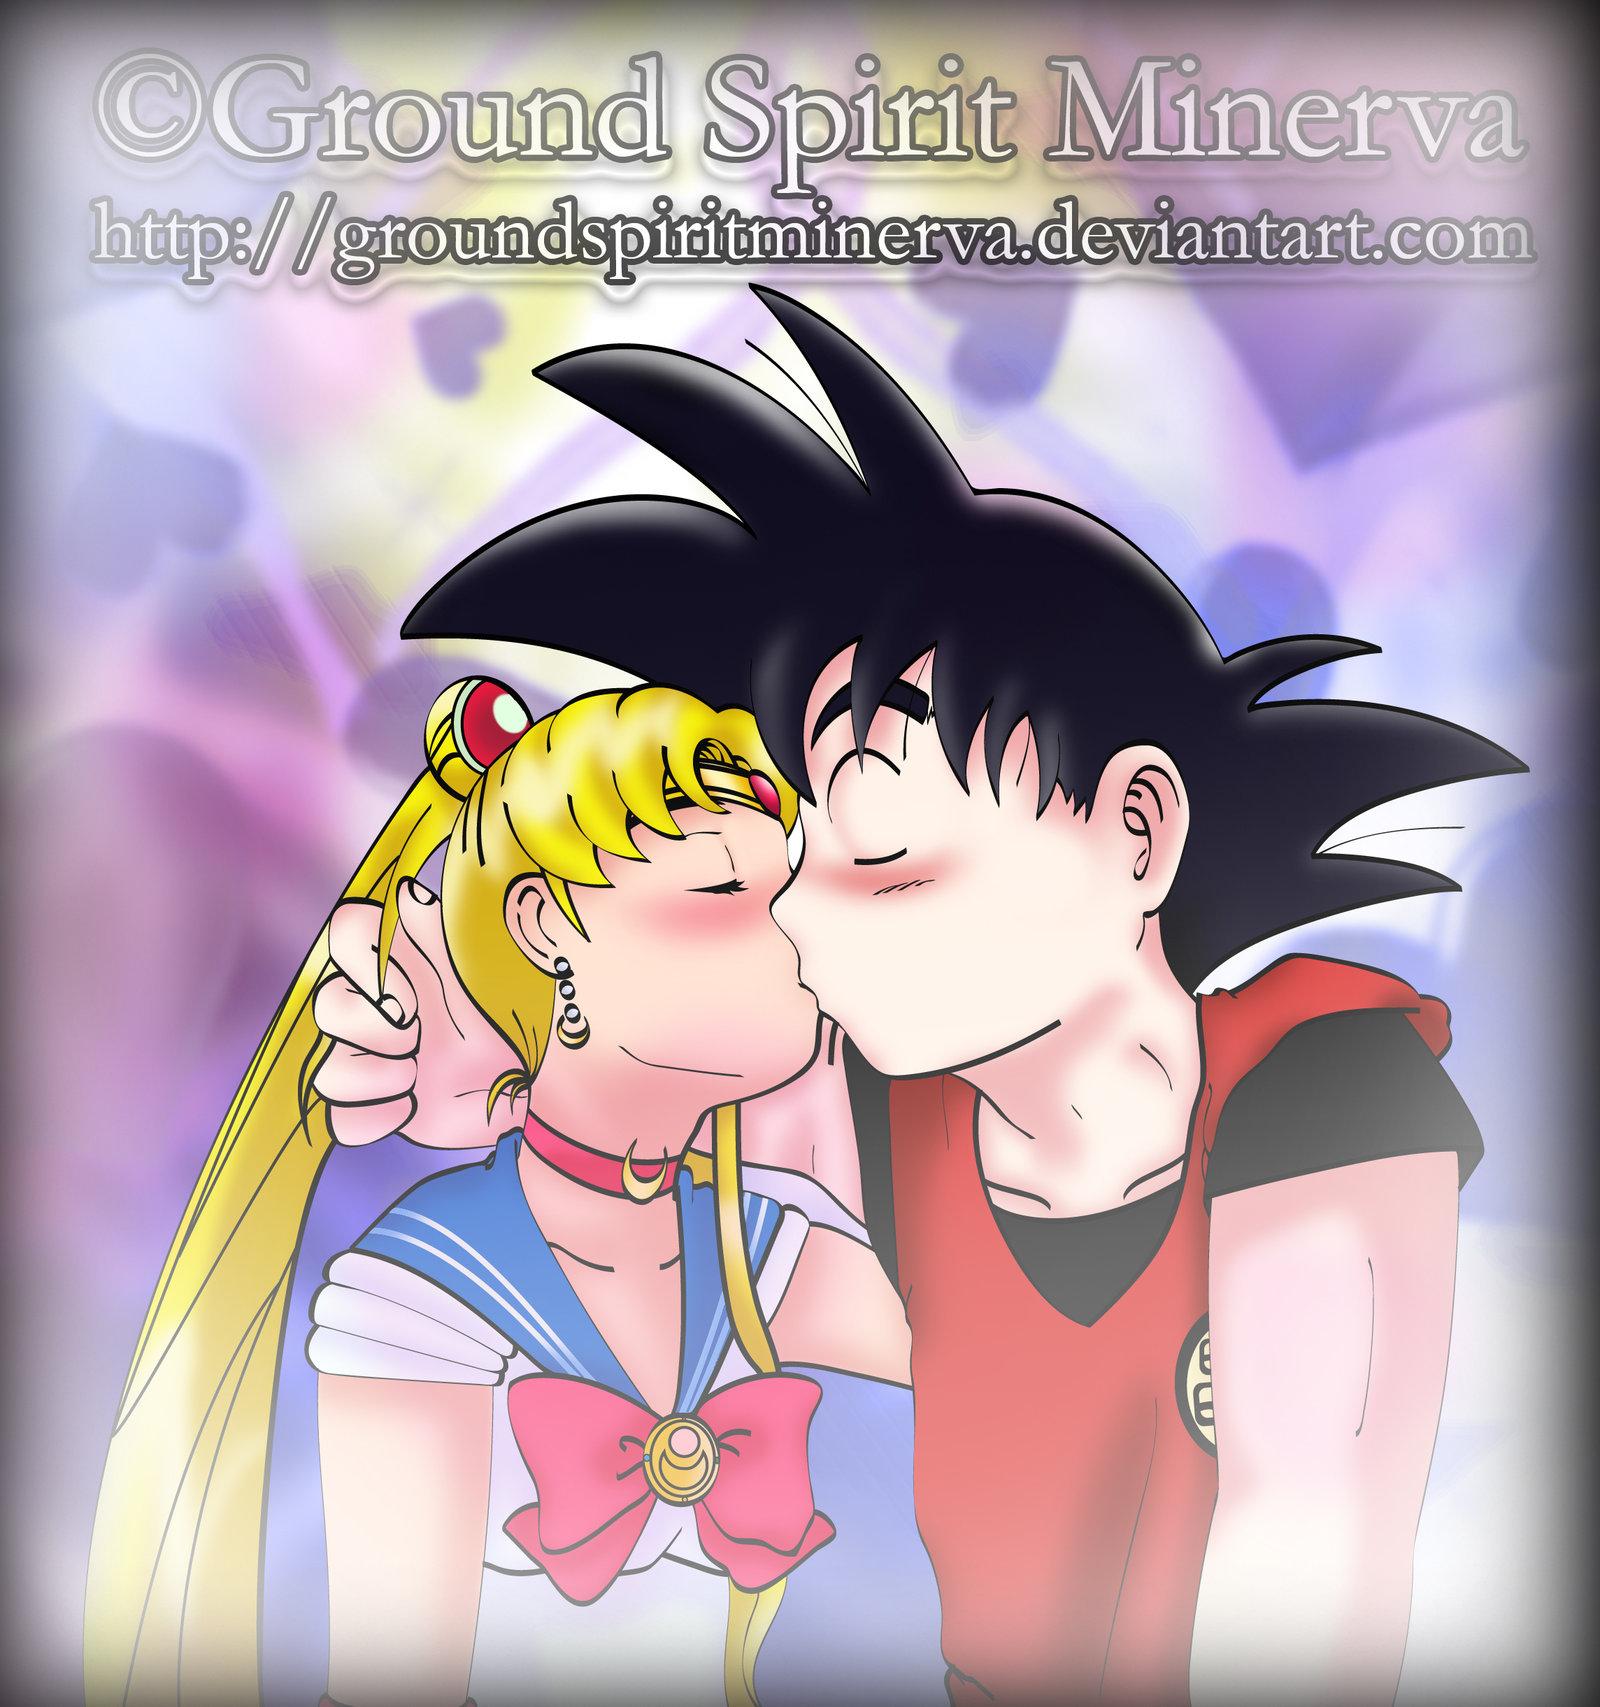 Goku and usagi love fan art by groundspiritminerva-d3cppsp